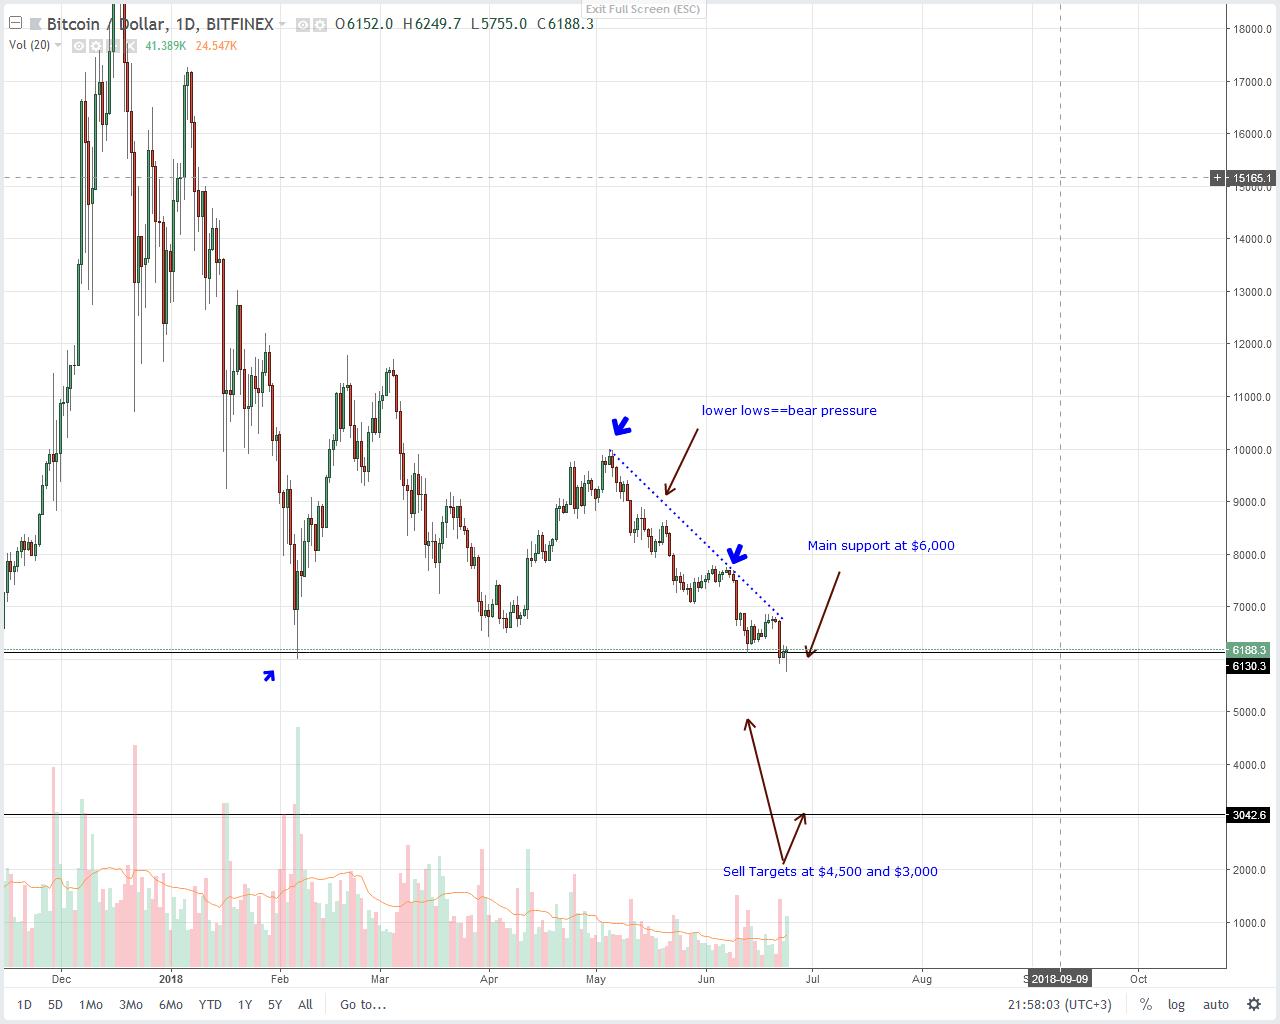 Bitcoin (BTC) Technical Analysis